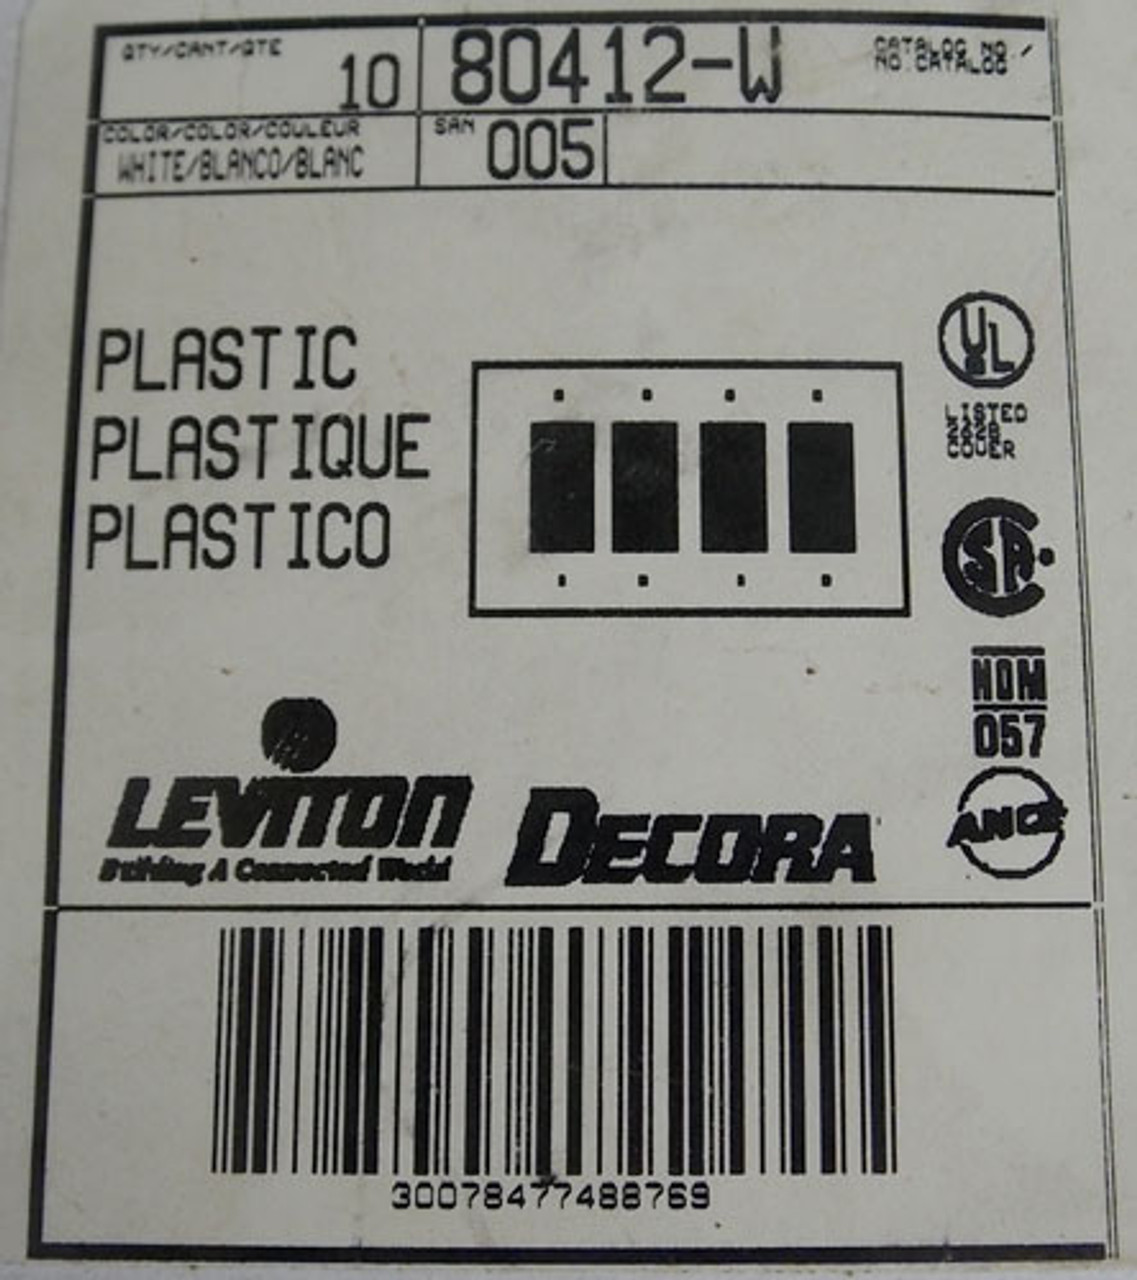 10Pc Leviton Decora 80412-W 4 Gang GFCI Device Wallplate White New